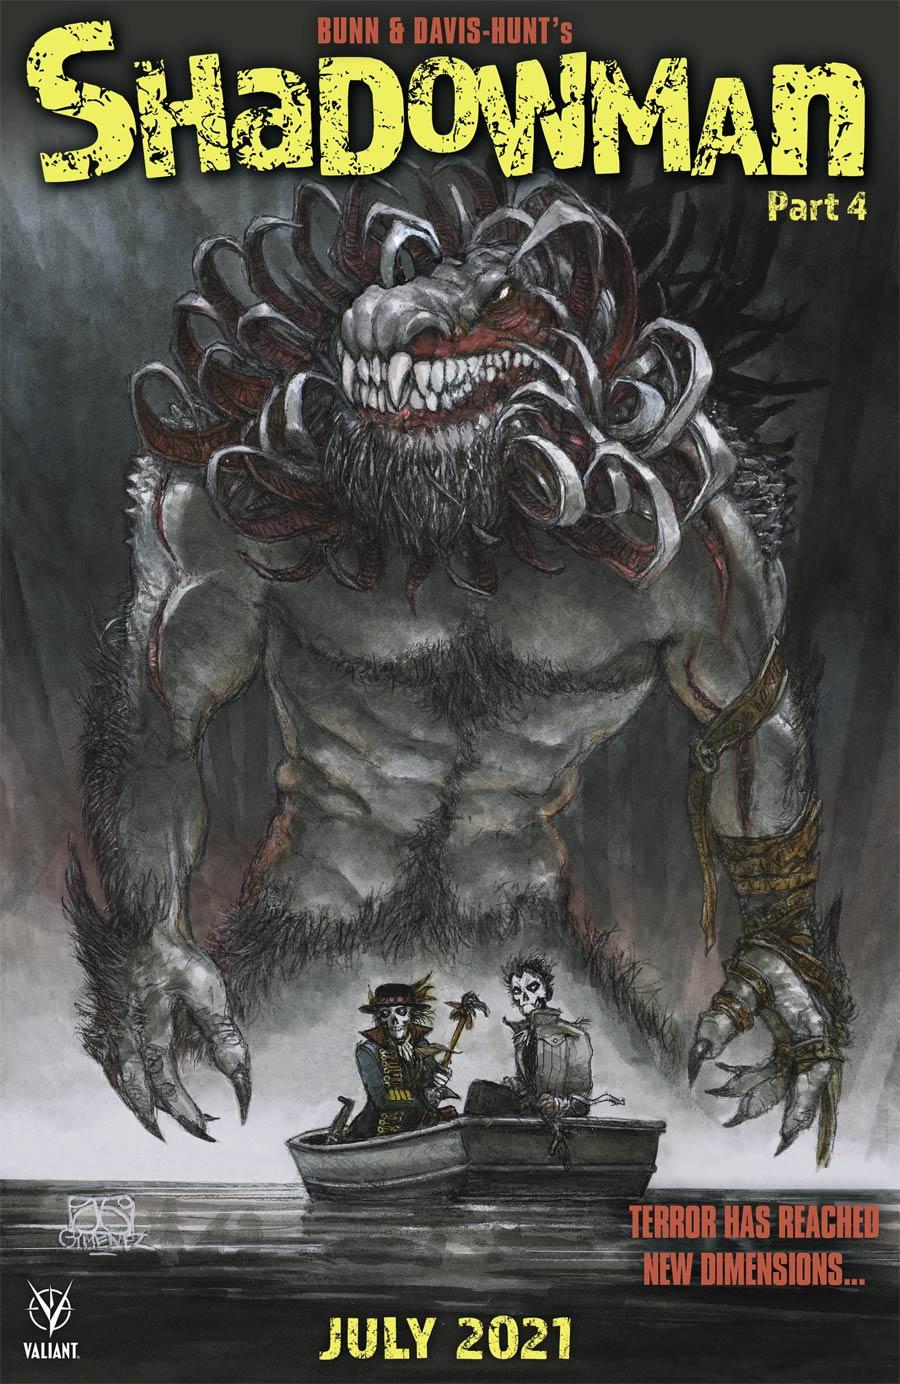 Shadowman Vol 6 #4 Cover C Variant Juan Gimenez Horror Movie Homage Cover